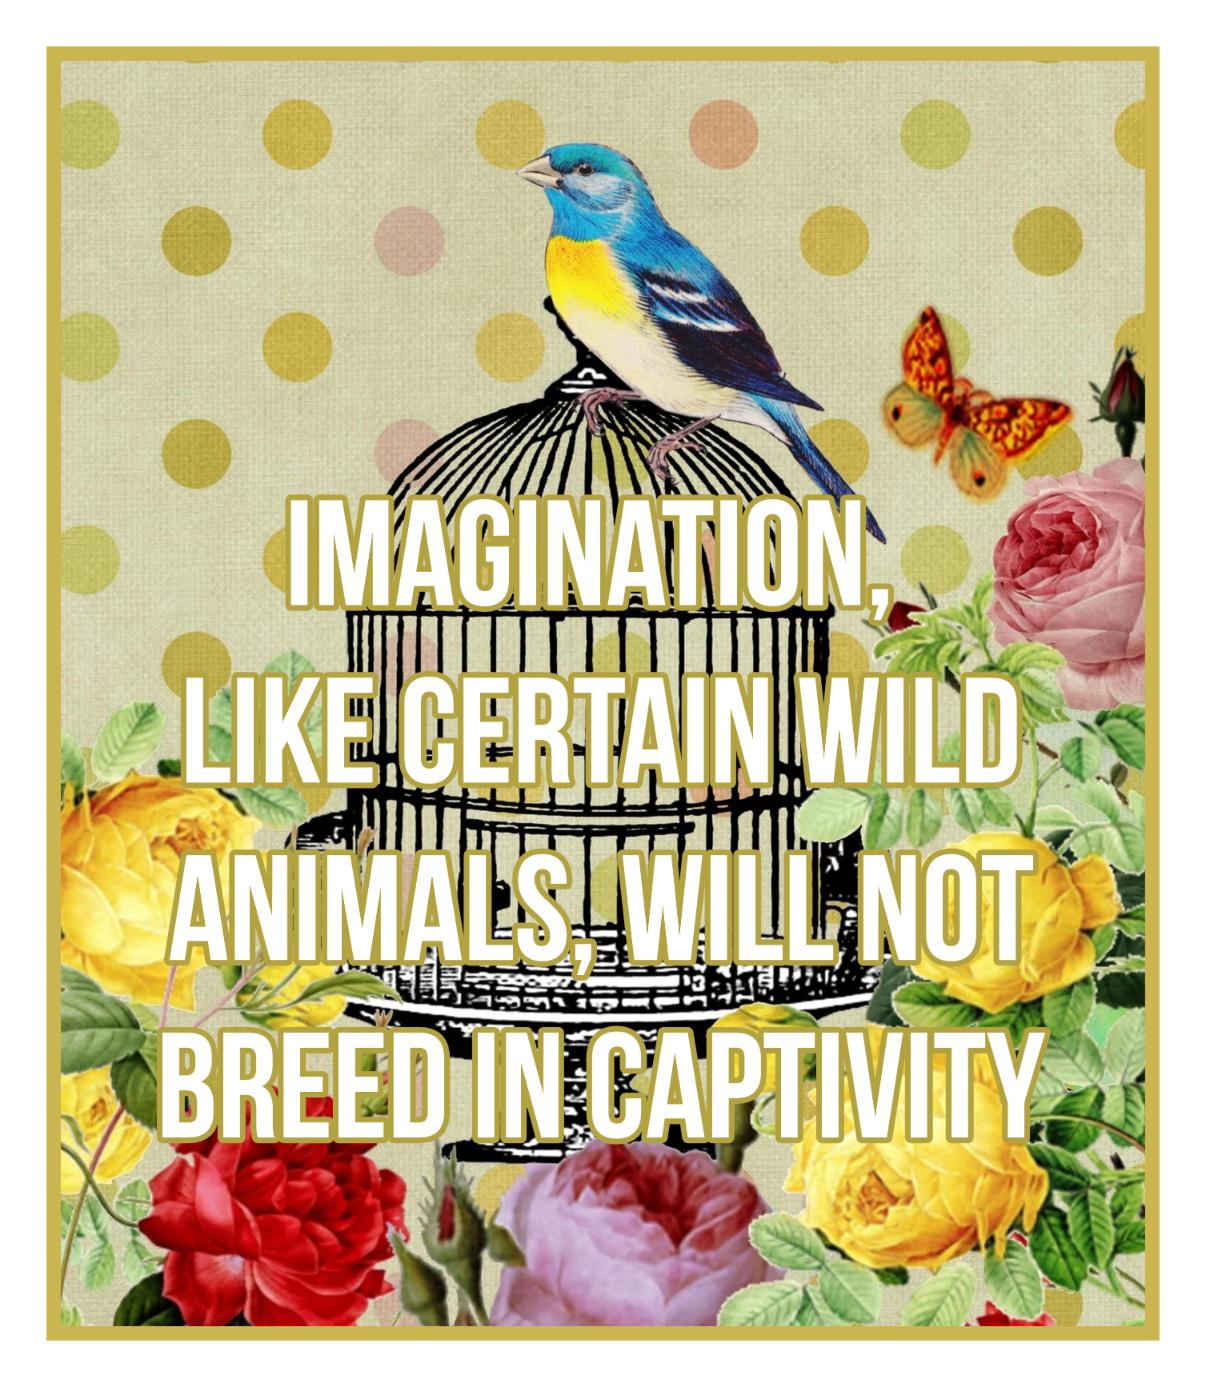 bekitschig blog Imagination like certain wild animals will not breed in captivity George Orwell